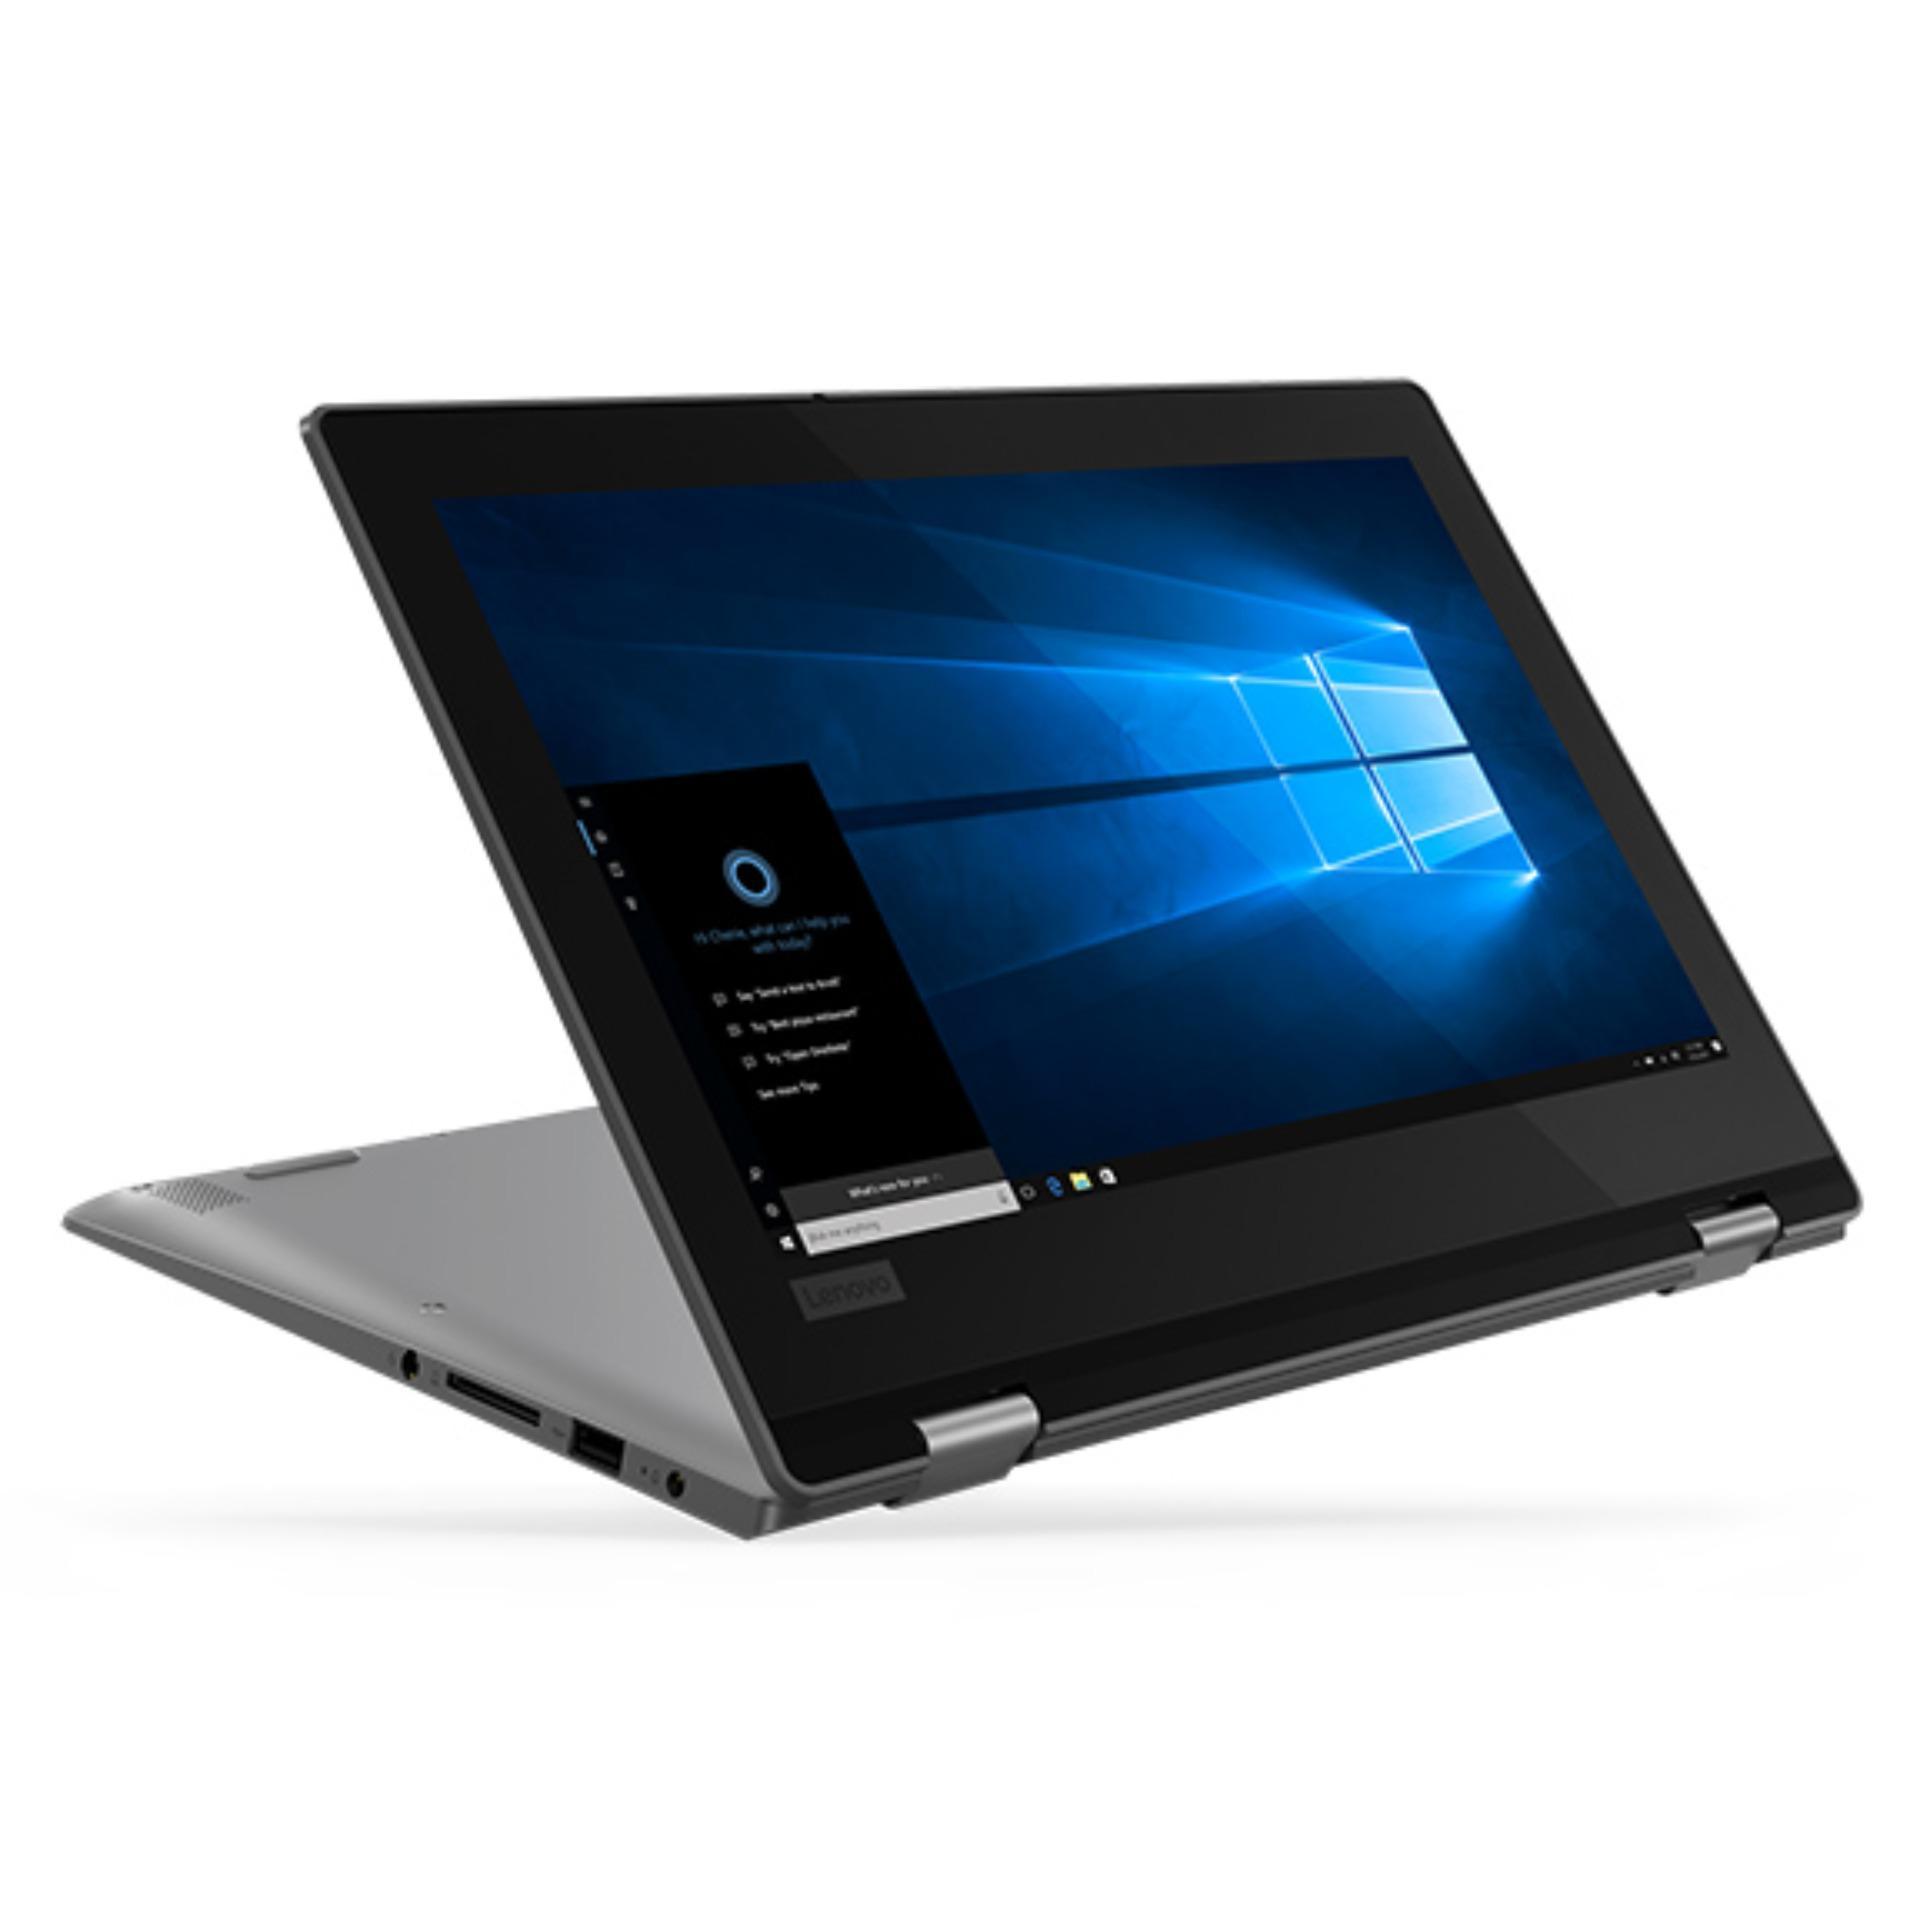 Lenovo Ideapad Yoga 330-51ID Pentium N5000 (4GBDDR4/256GBSSD/Integrated/Windows10Home/11.6inch/Black/1YR) Touchscreen